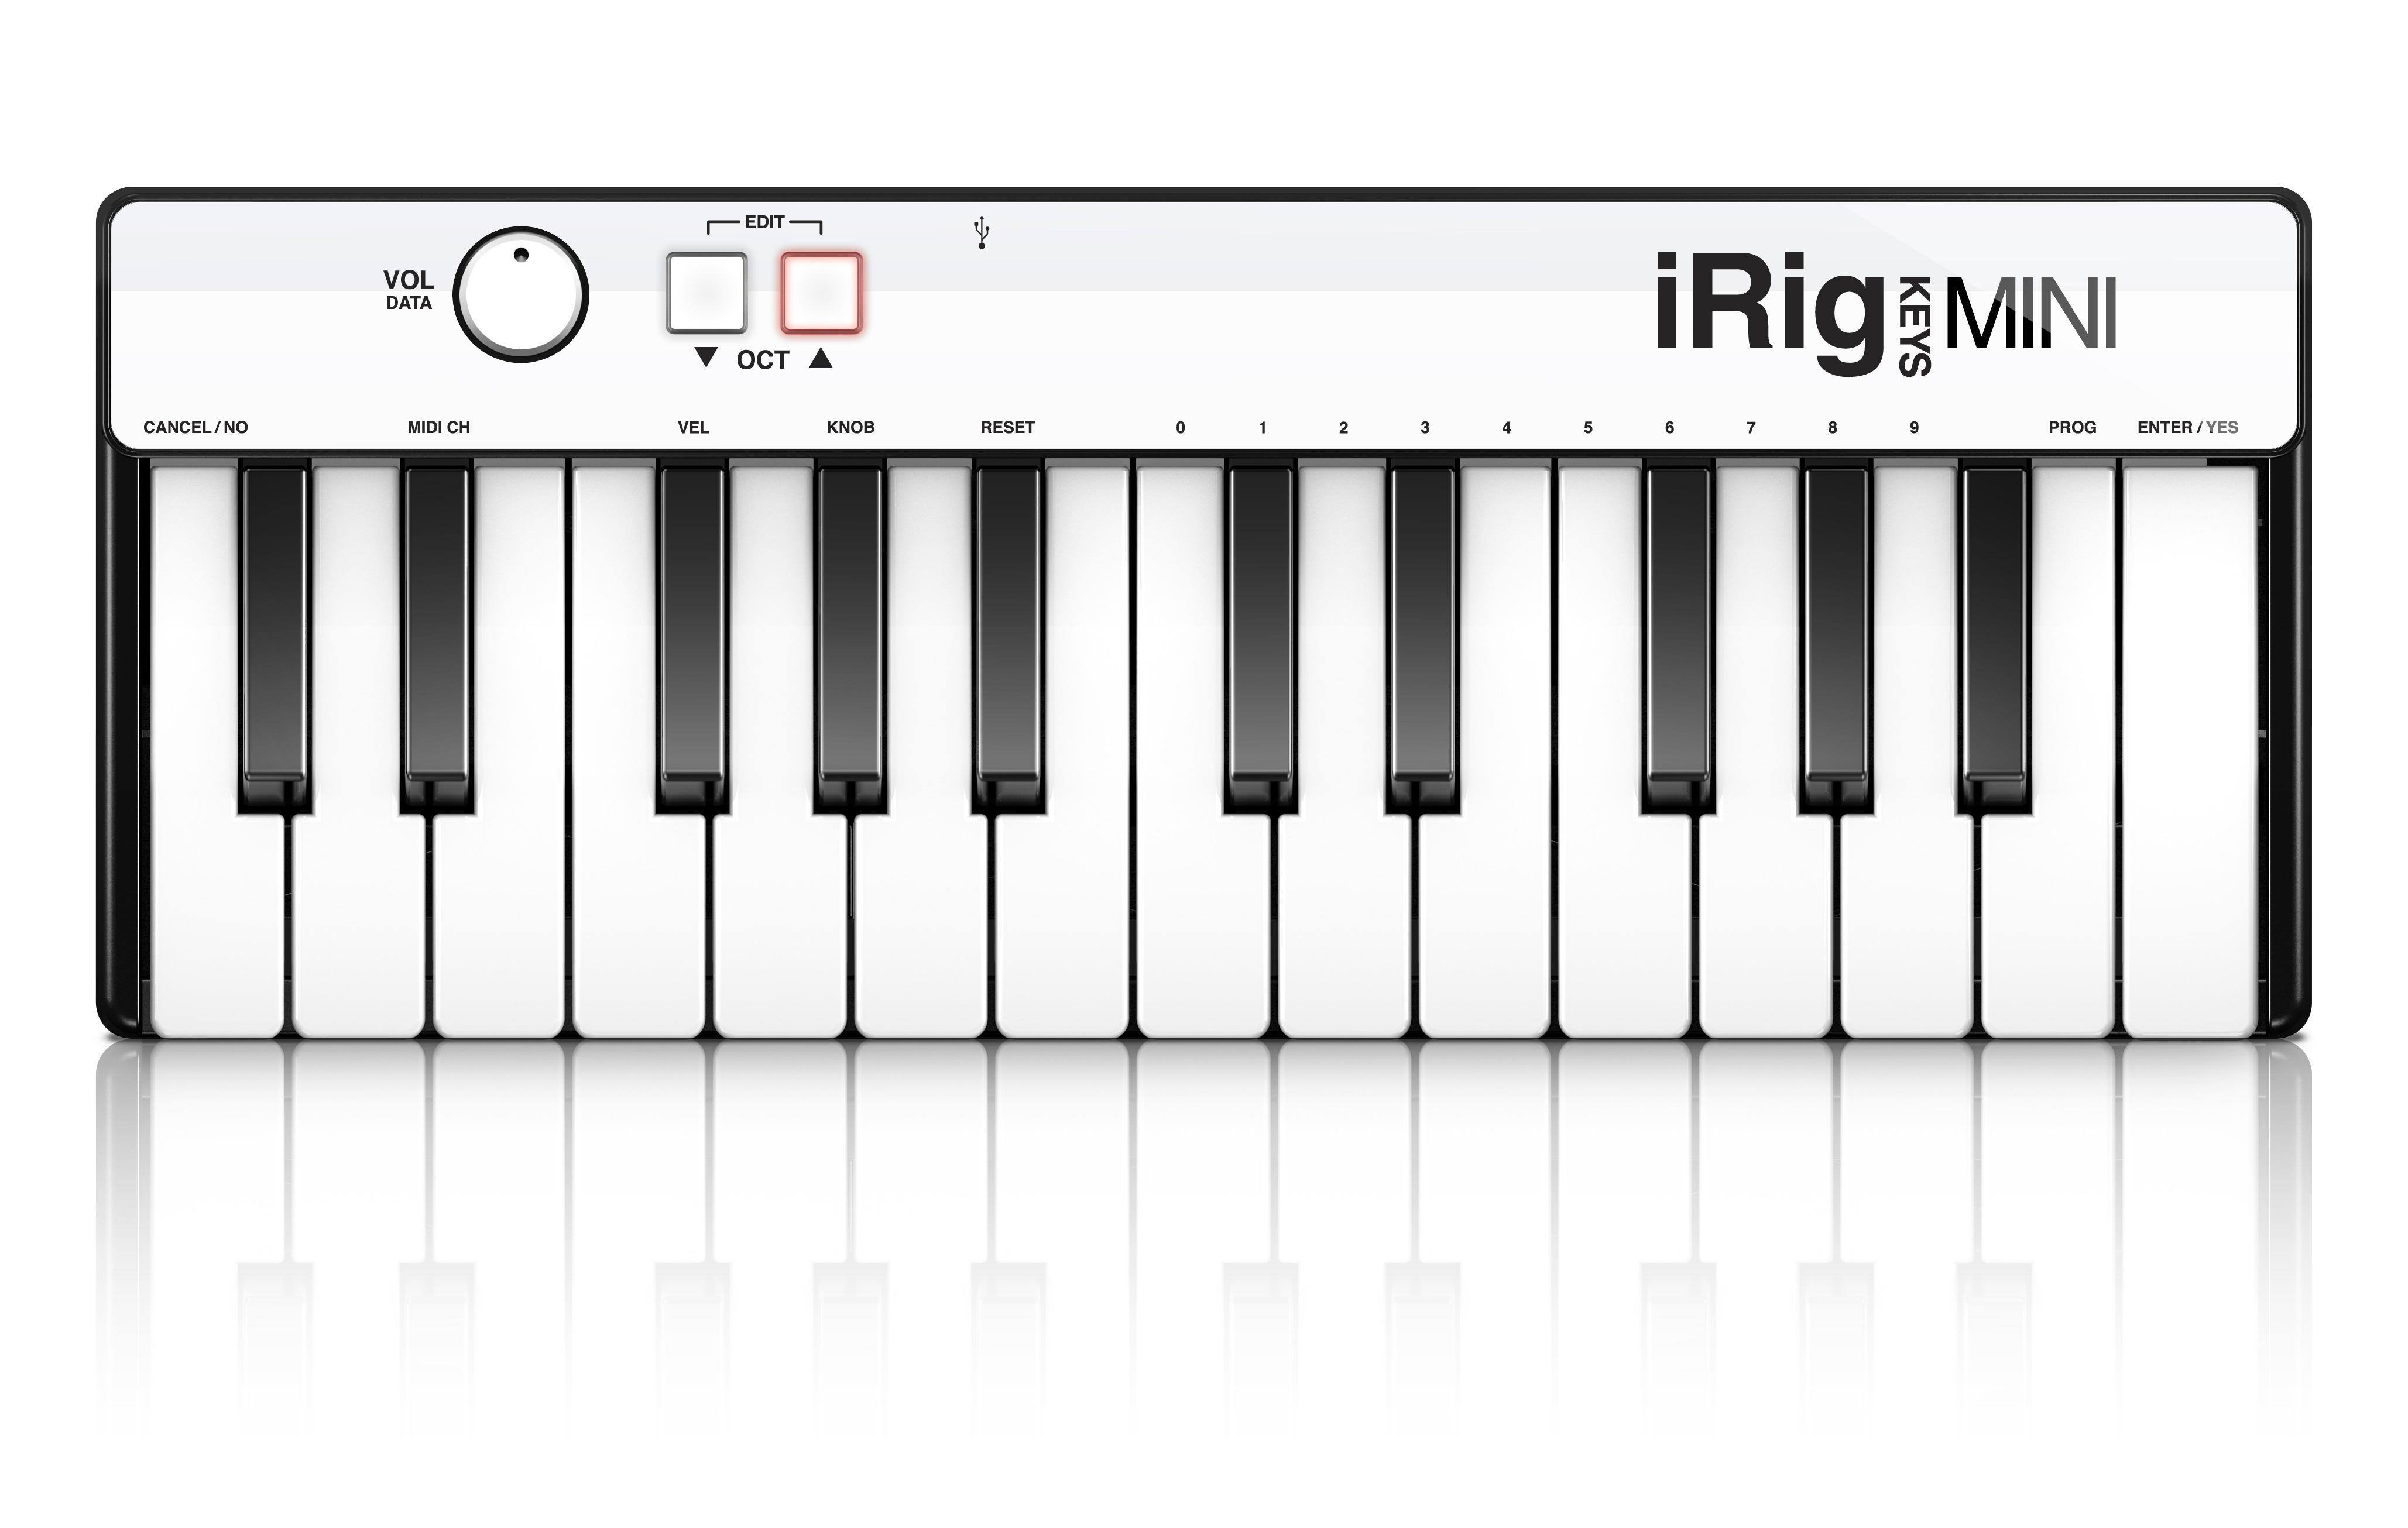 Клавиатура фортепиано картинка крупным планом